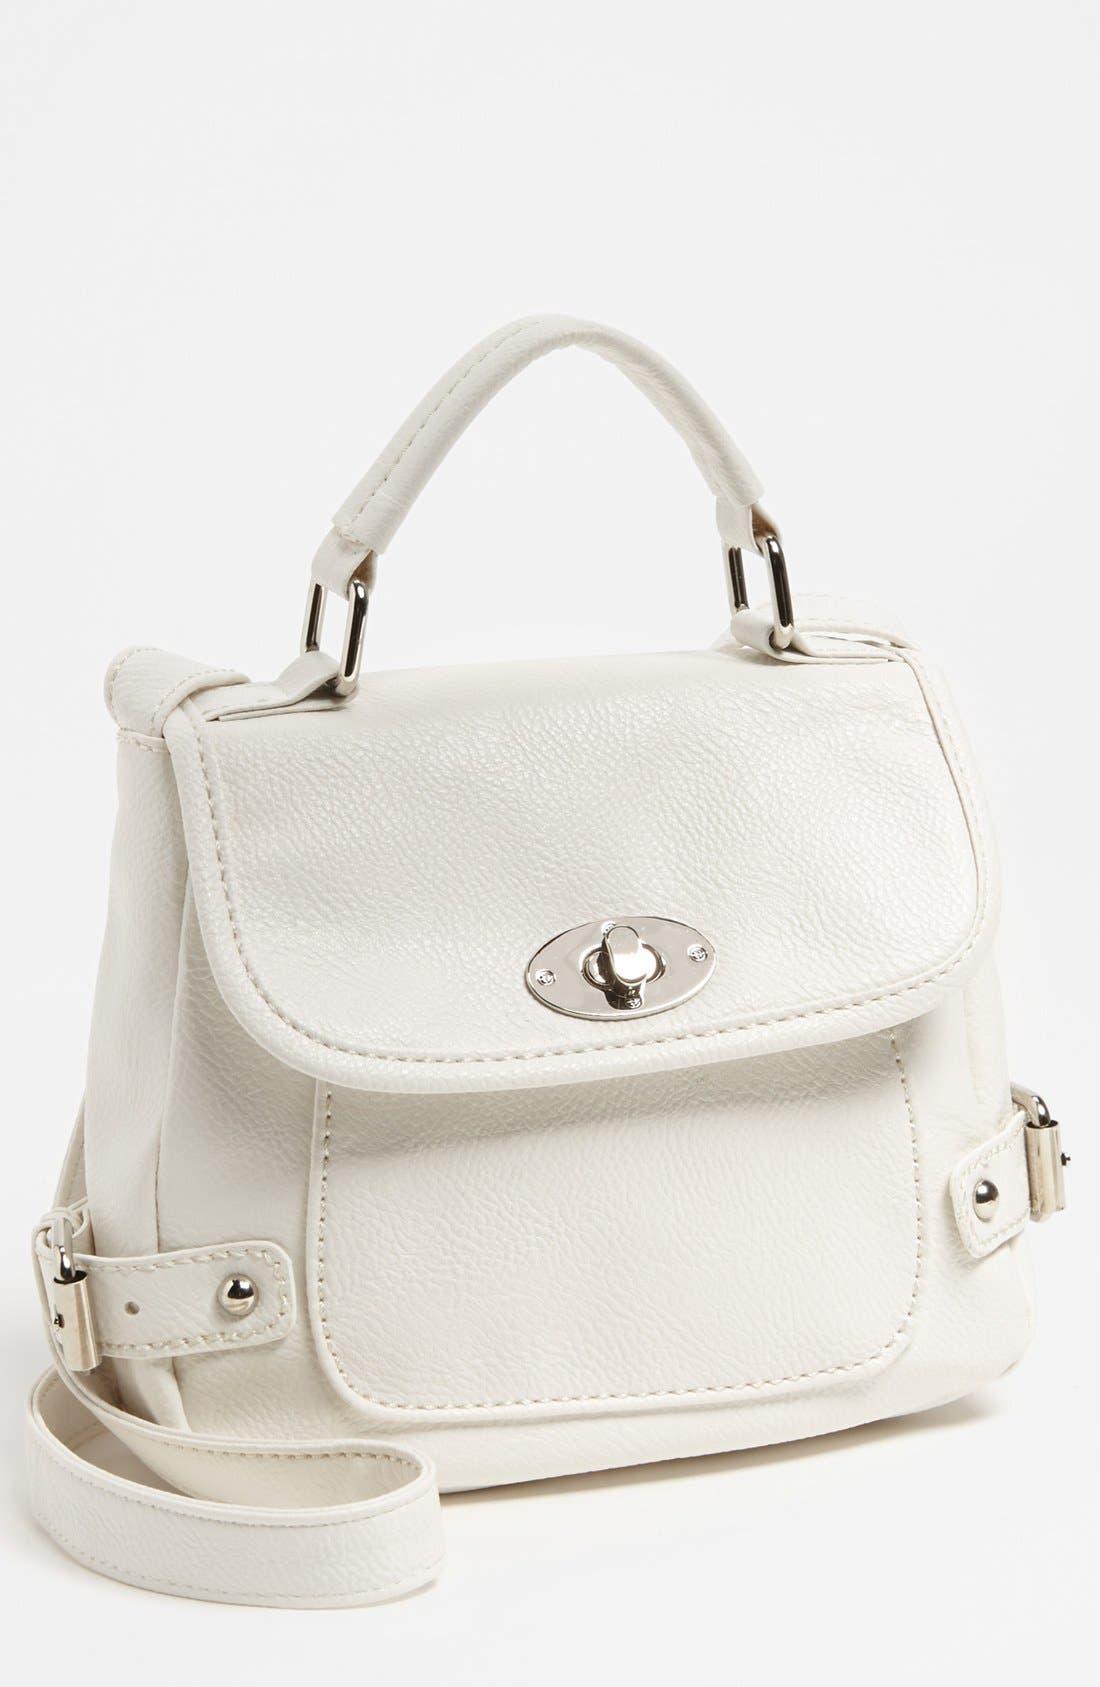 Main Image - Cesca 'Top Notch' Crossbody Bag, Small